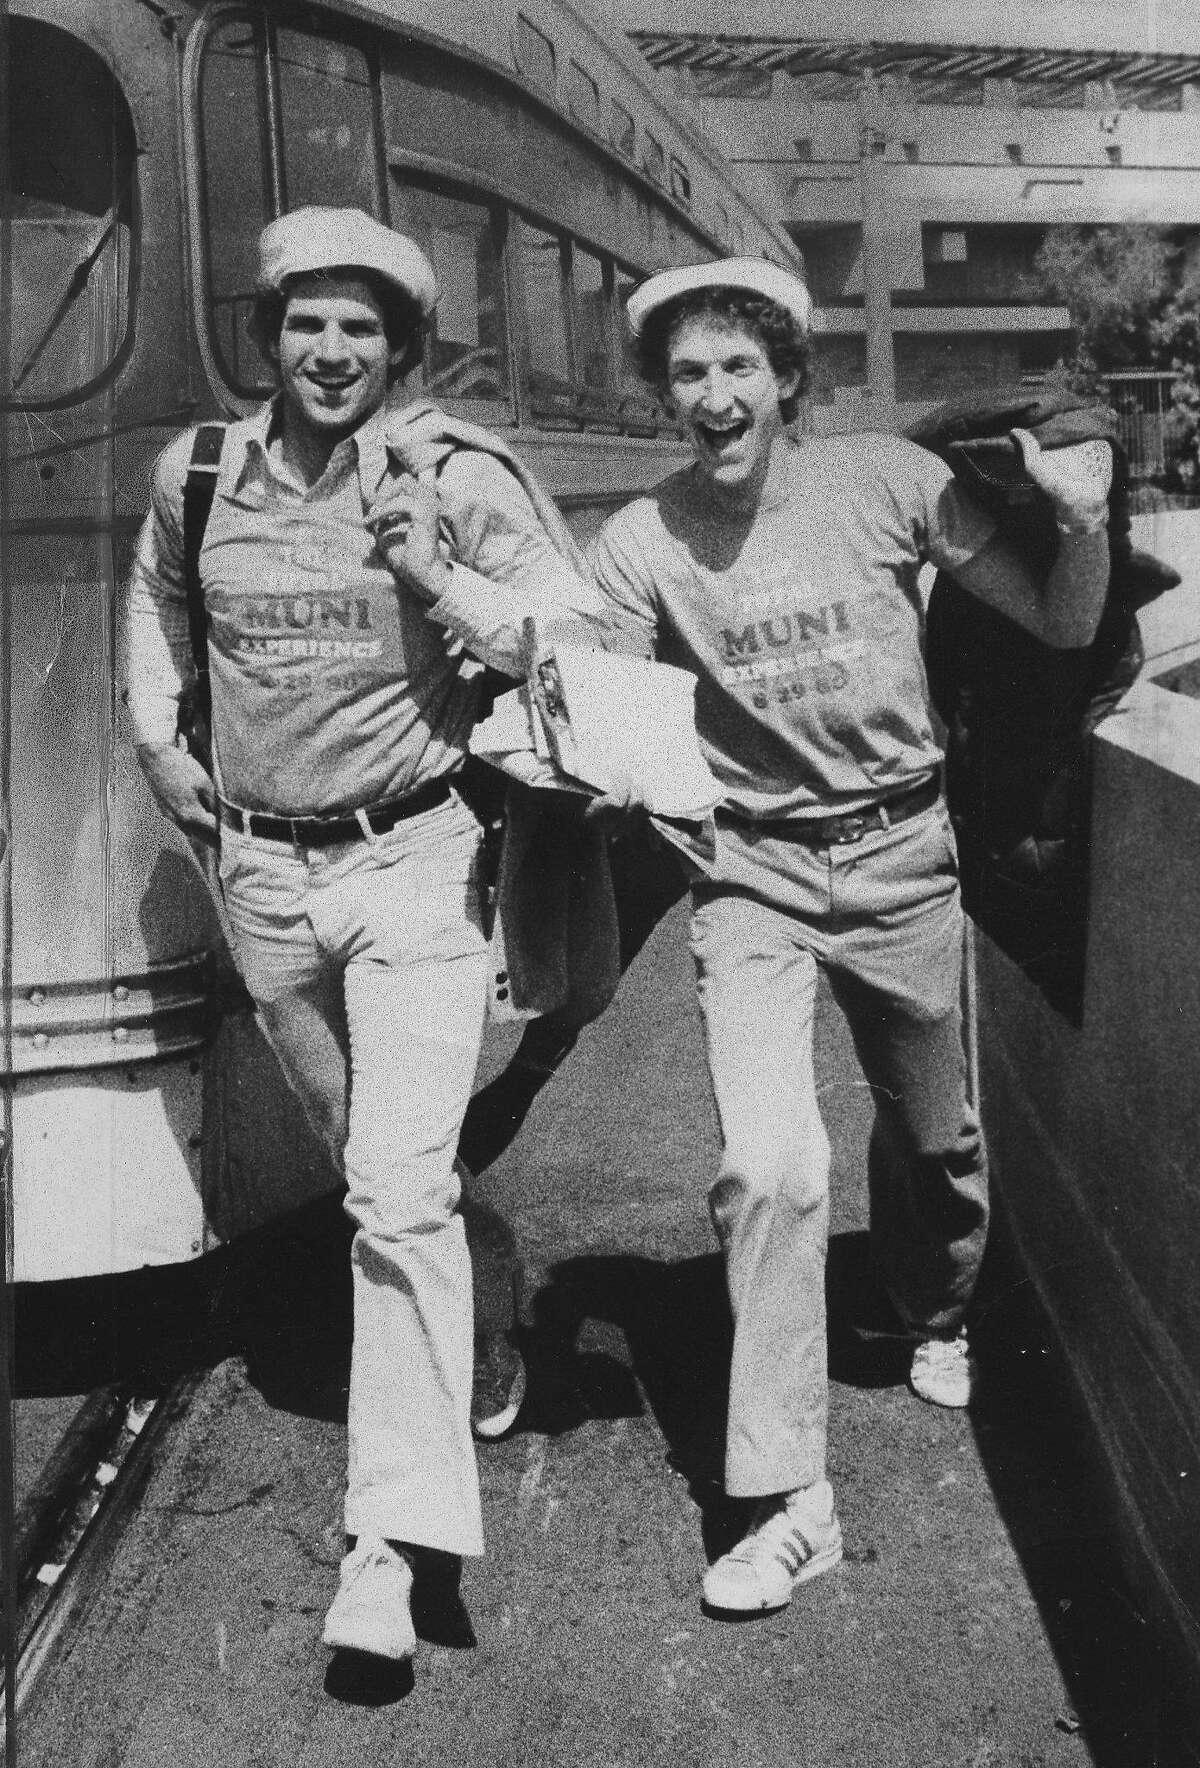 Andy Coblentz (l) and Larry Baer ride the Muni Photo ran 8/20/1980